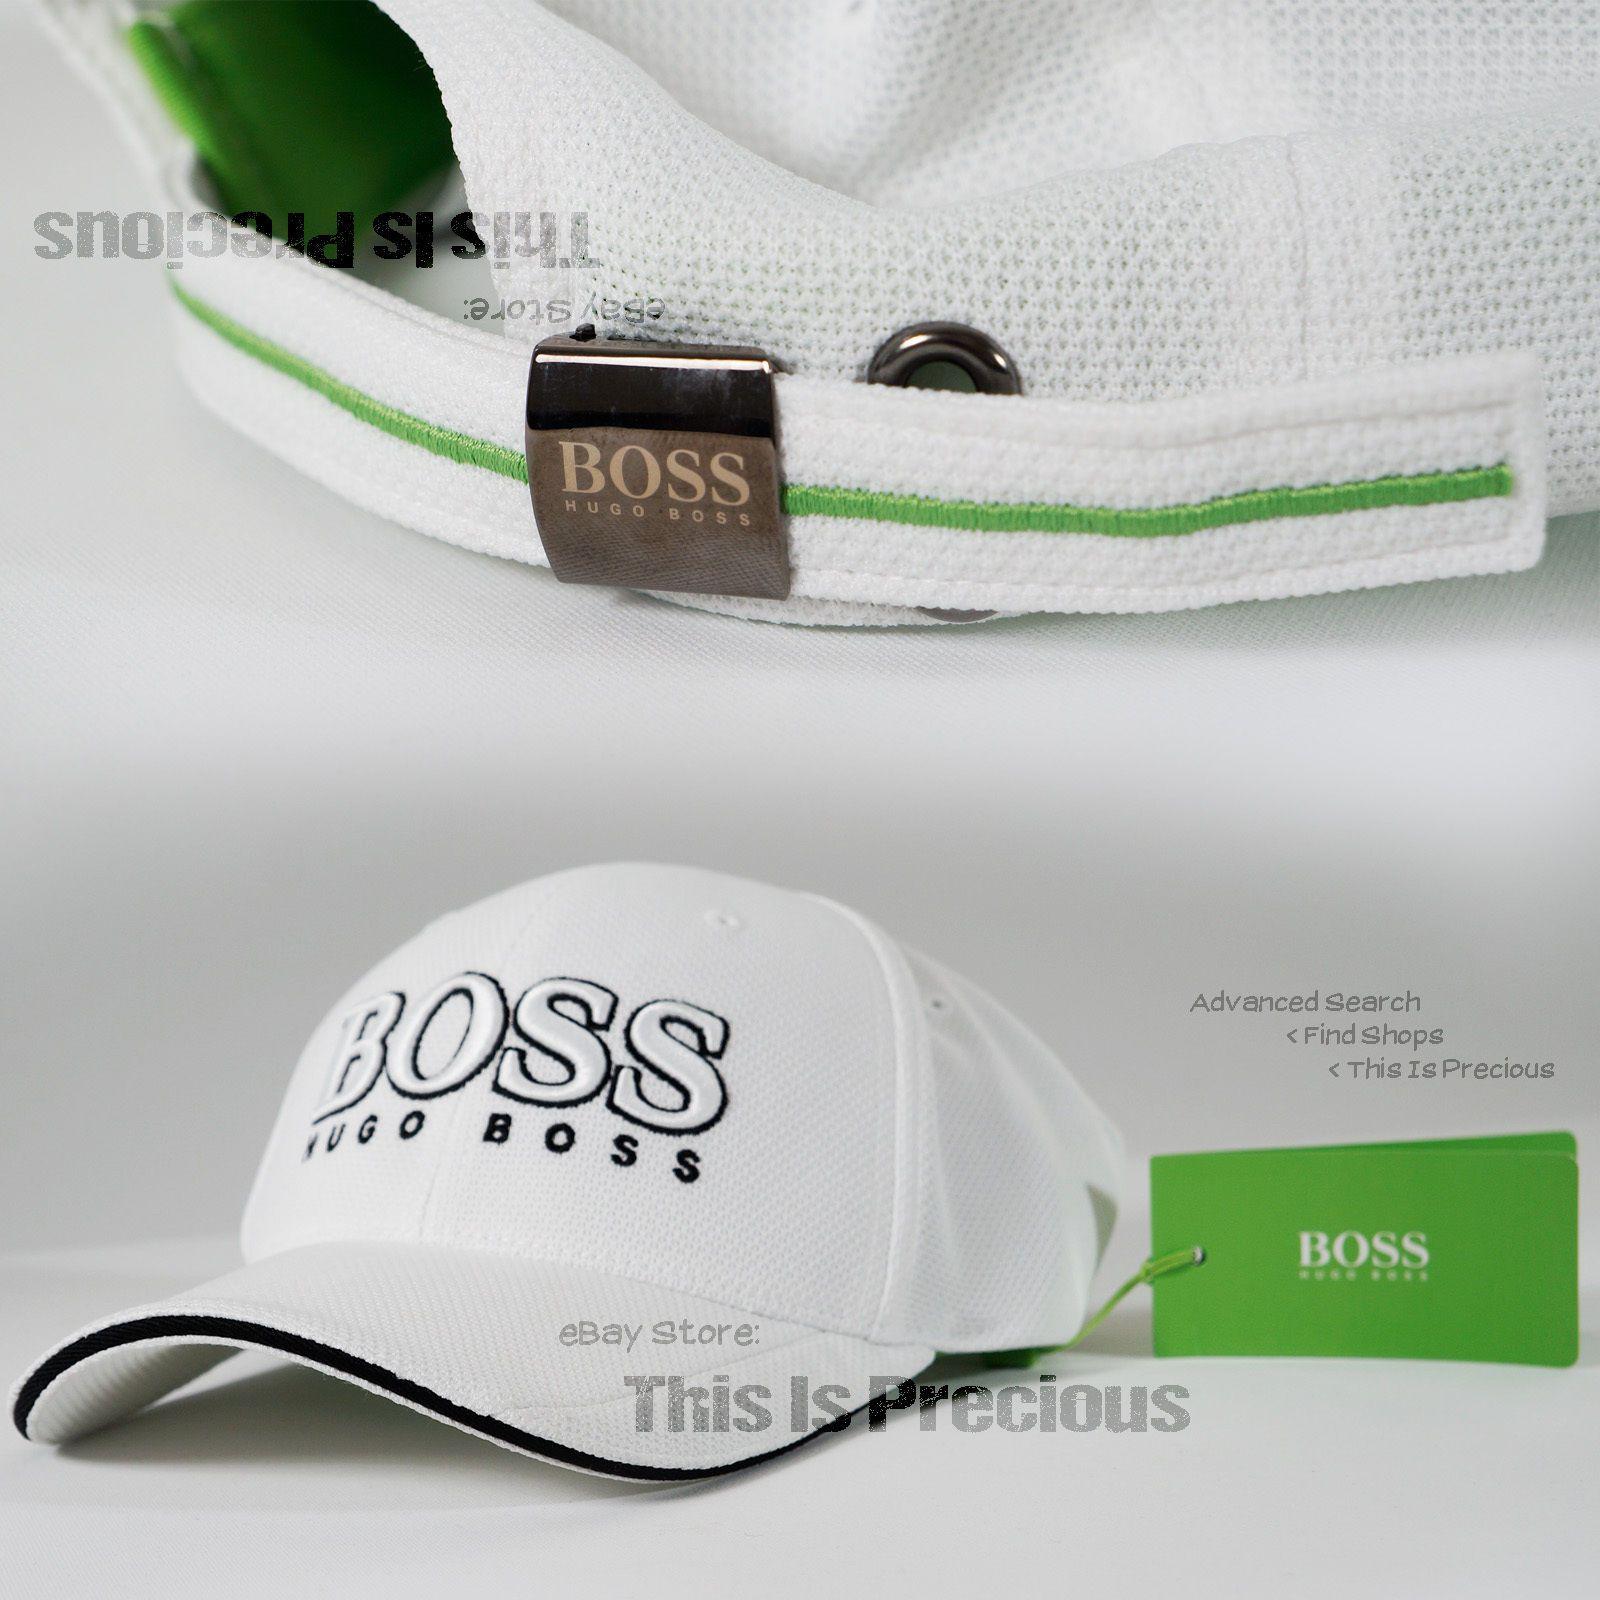 ca61bc7c0c523 New Hugo Boss Golf Hat Curved Bill No Flat Visor Baseball Cap Strap  Adjustable